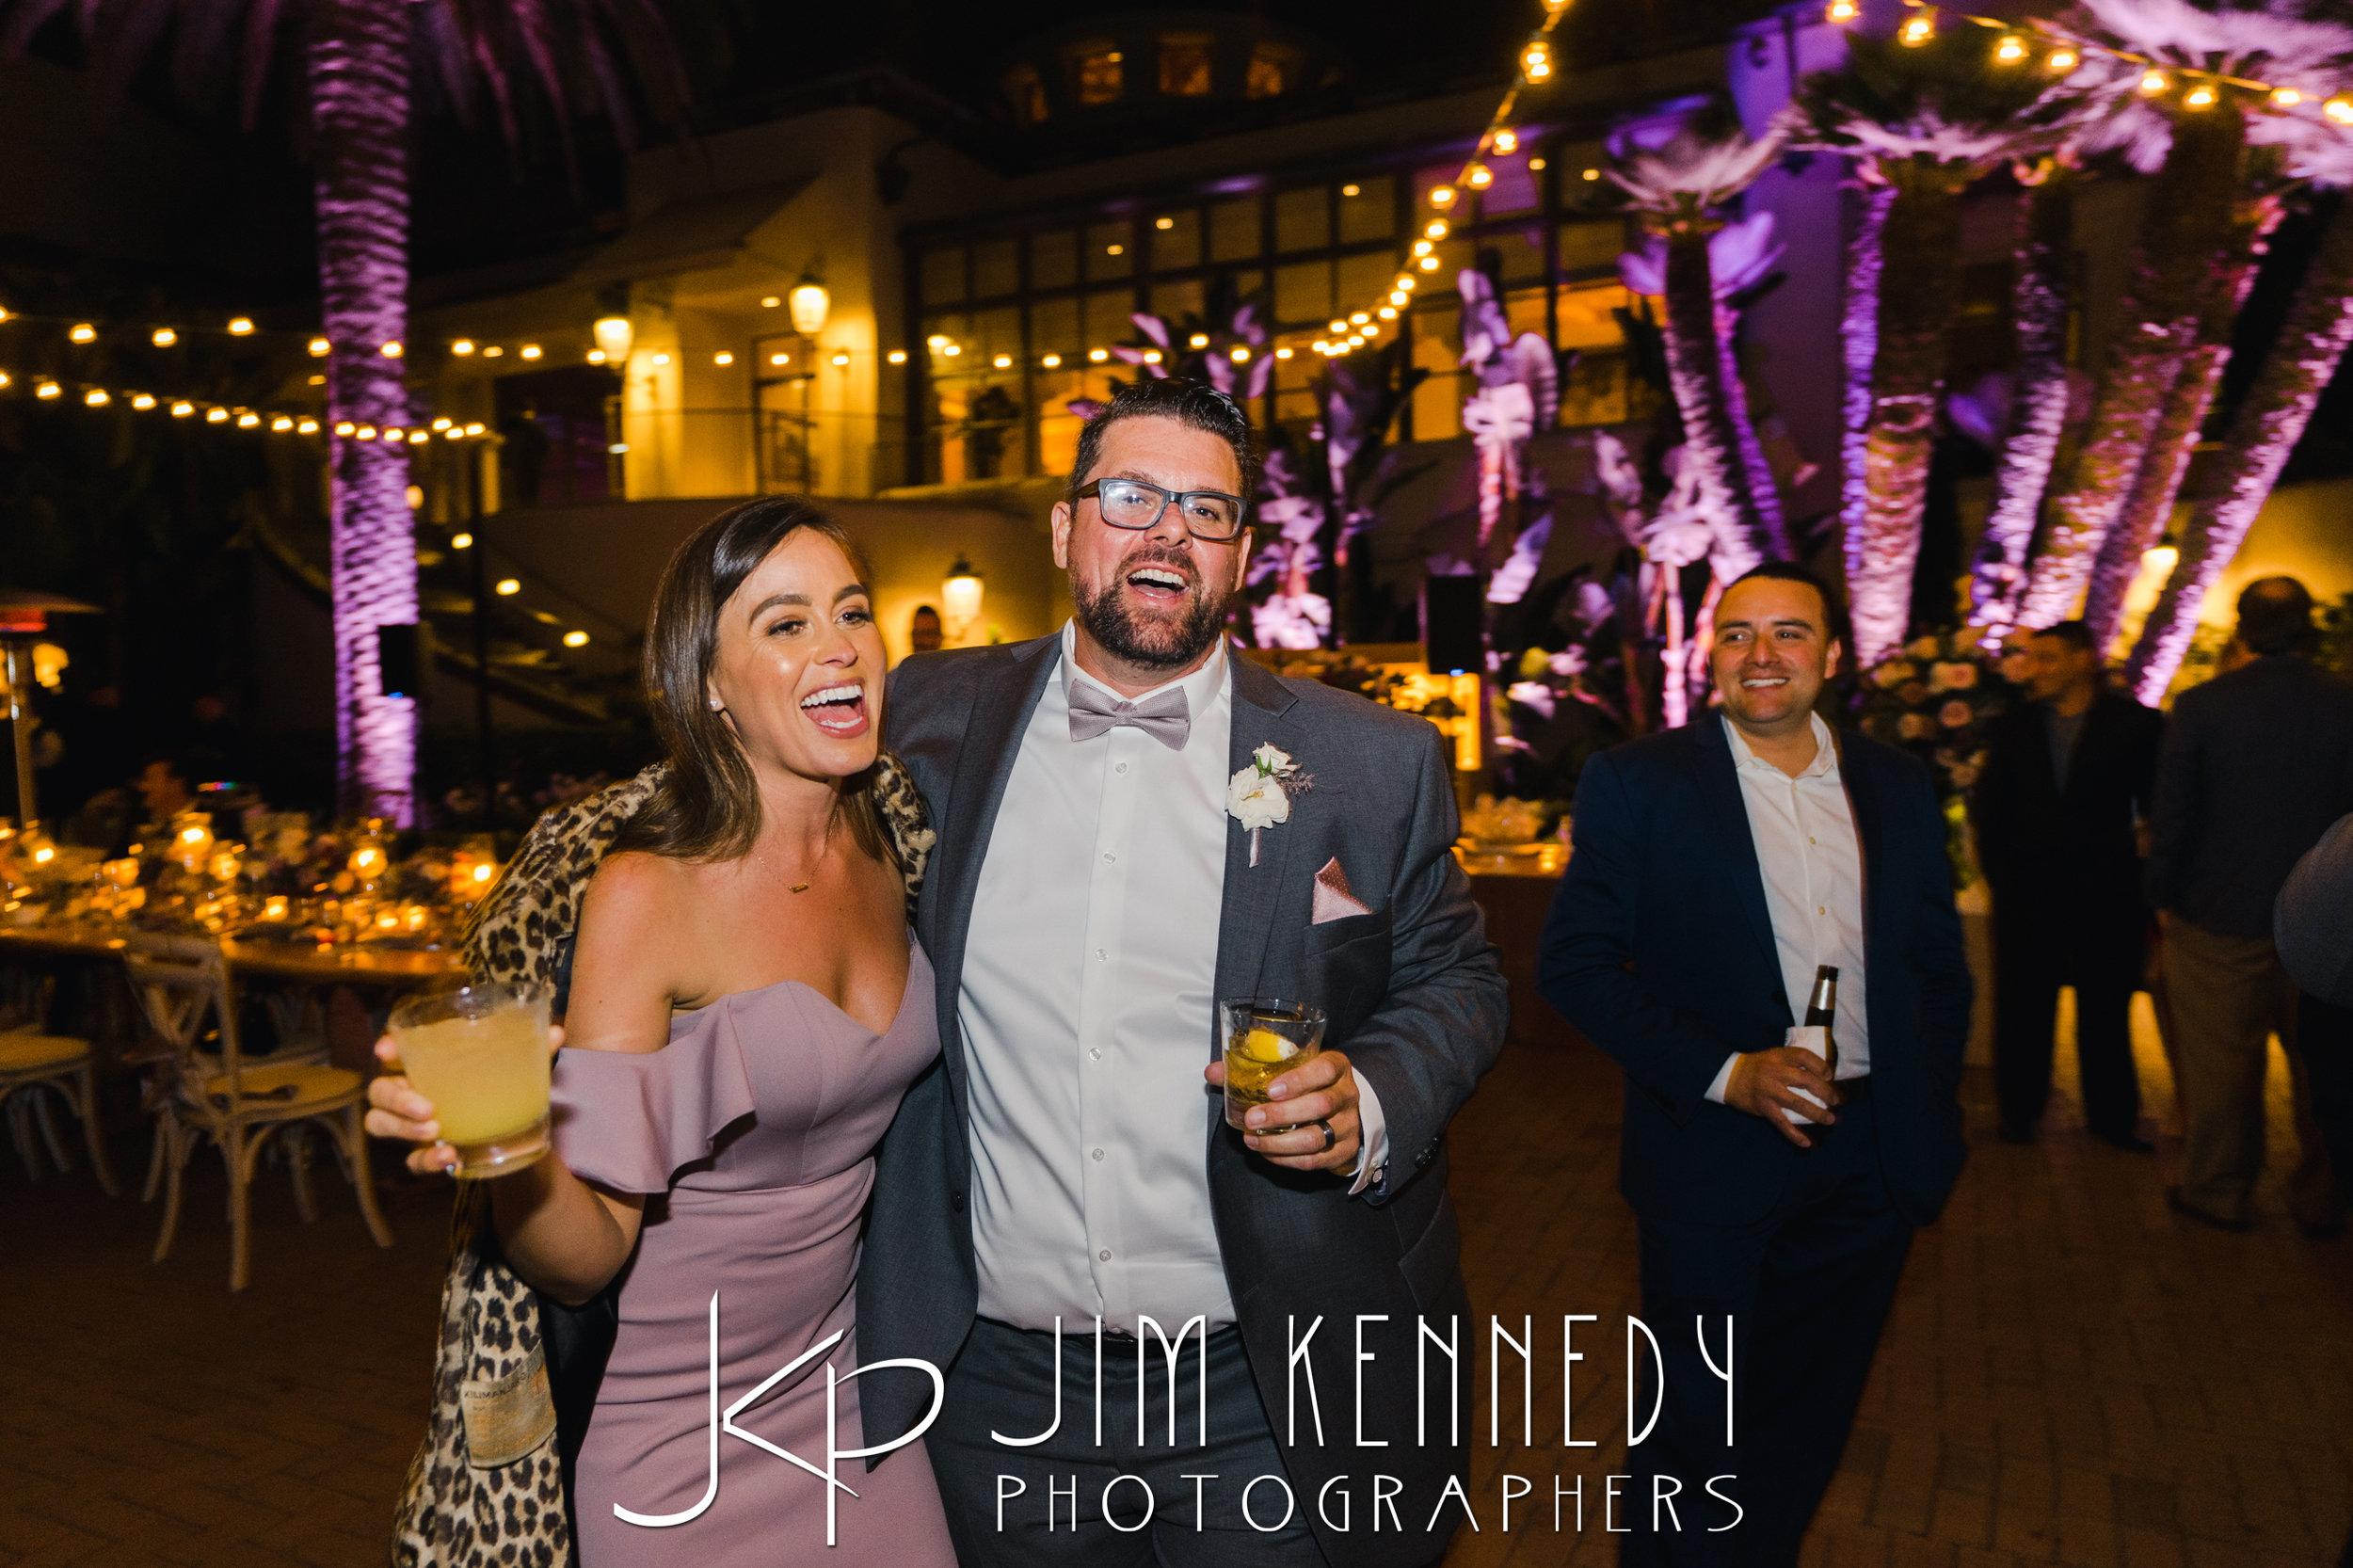 pelican-hill-wedding-jim-kenedy-photographers_0246.JPG